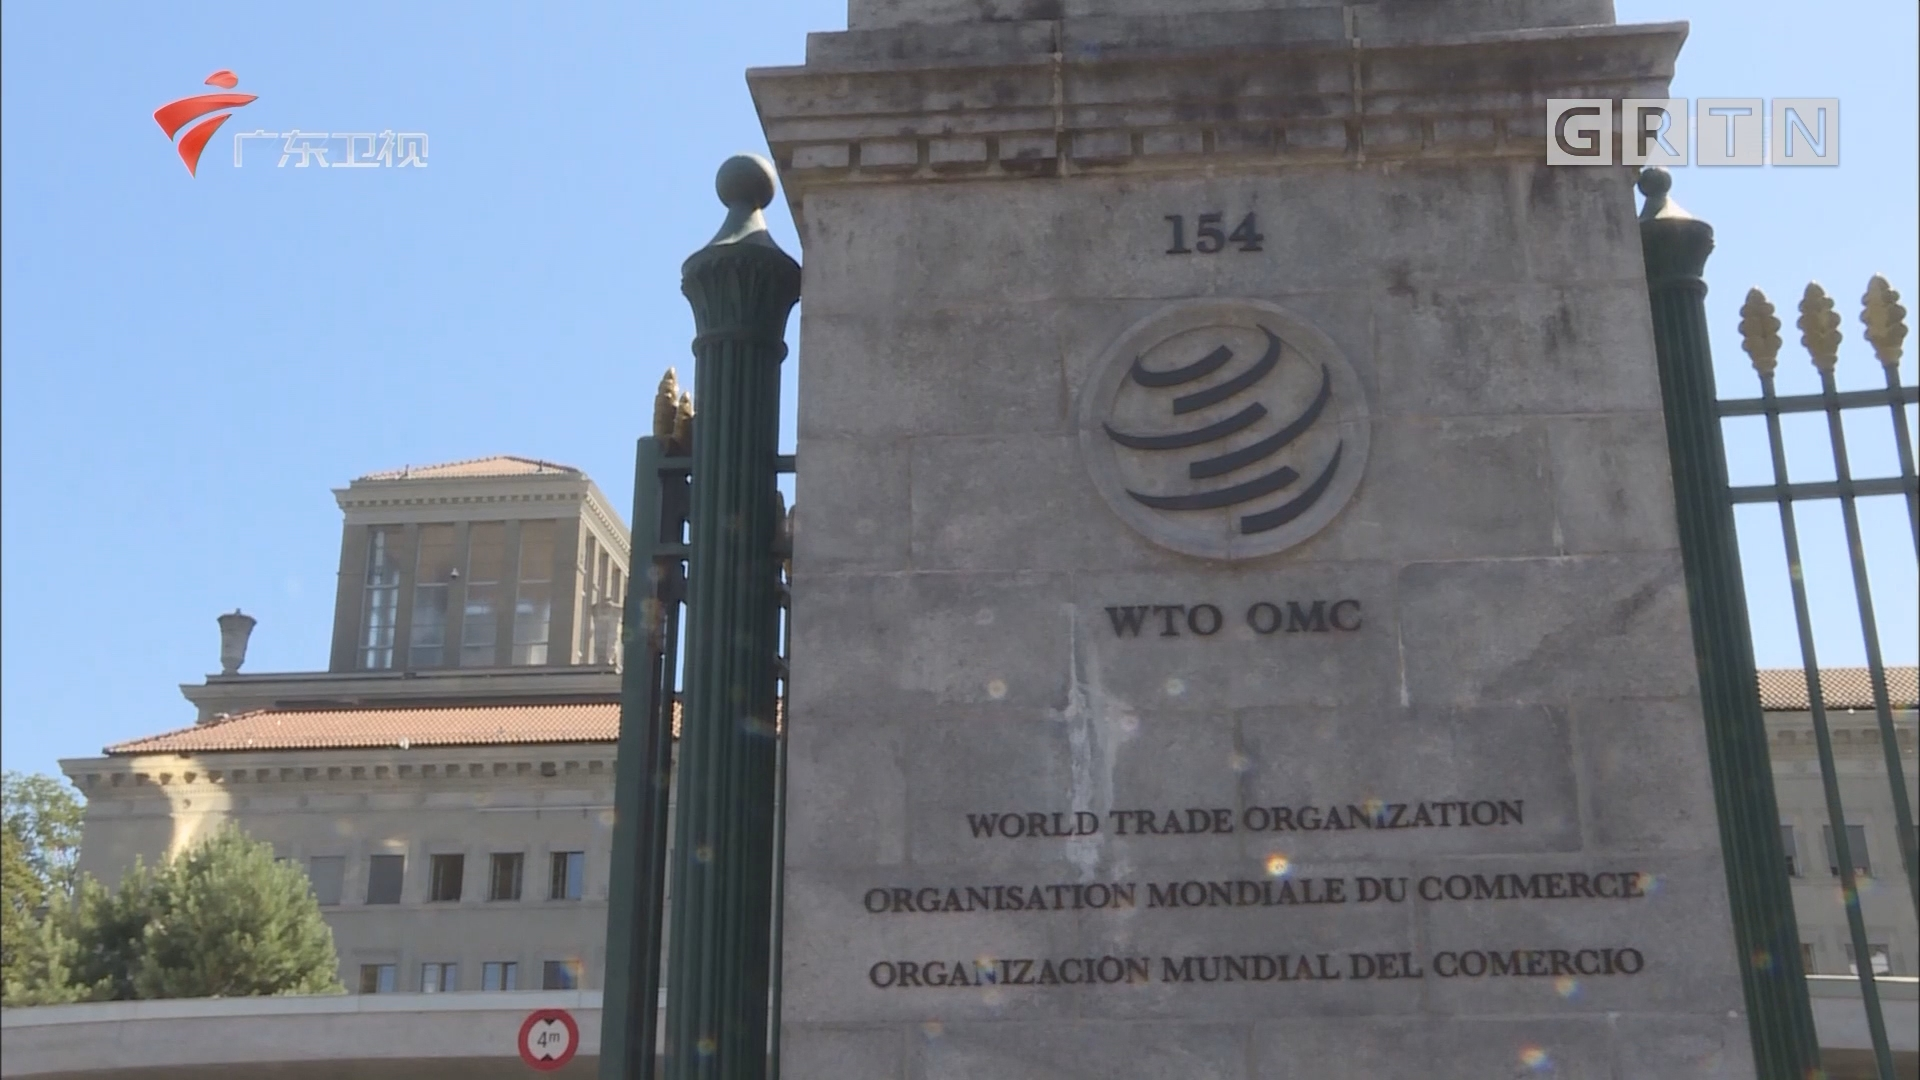 WTO对中国第七次贸易政策审议:中国是多边贸易体制的坚定支持者